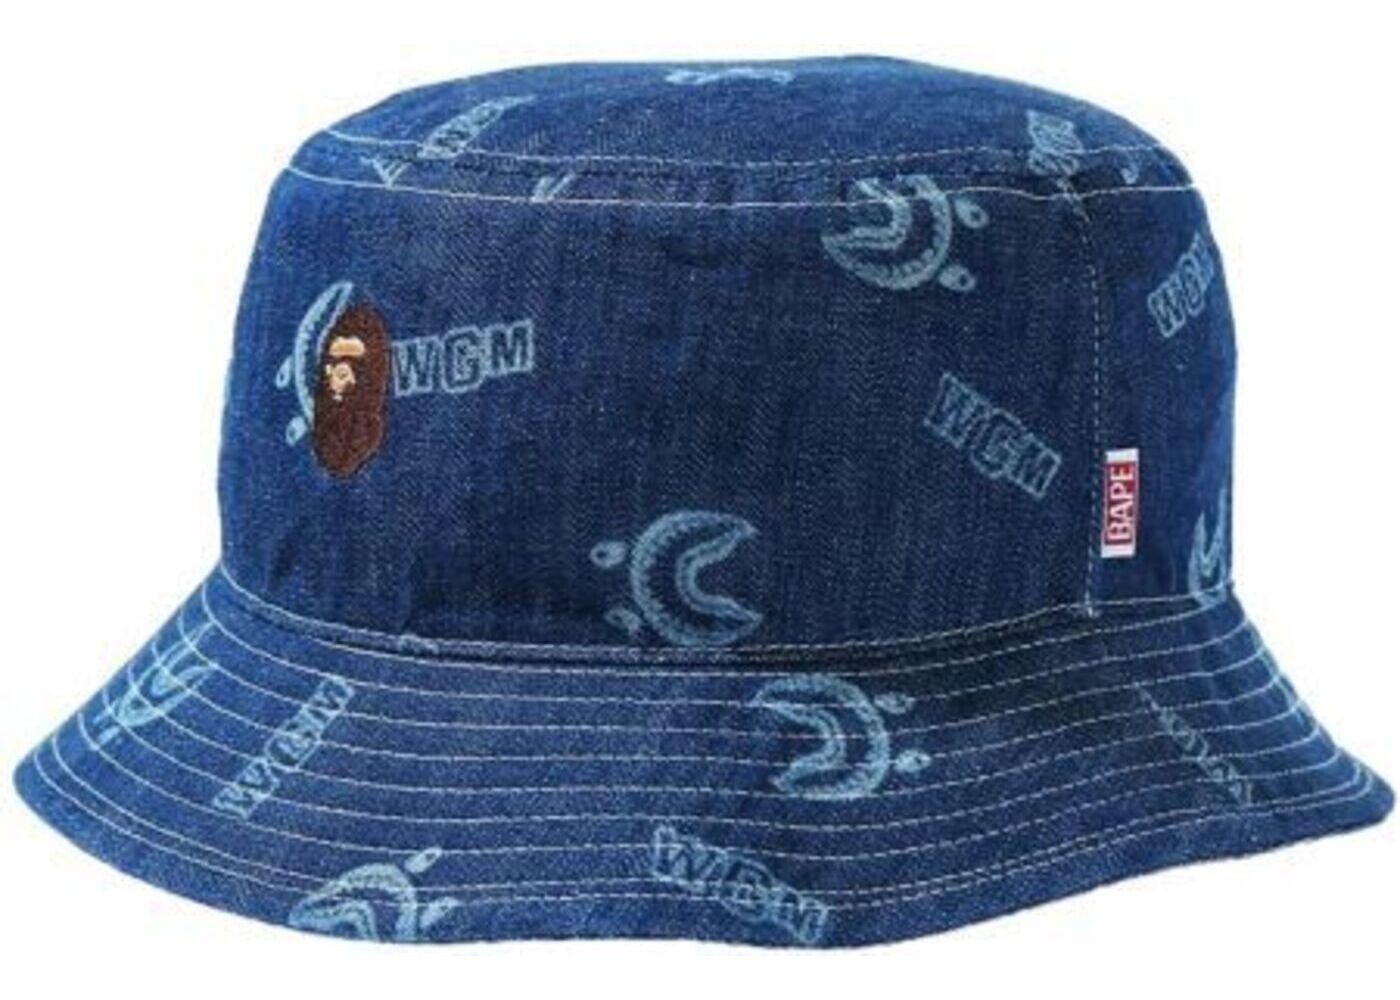 Bape Shark Pattern Denim (W) Bucket Hat Indigo (SS21)の写真